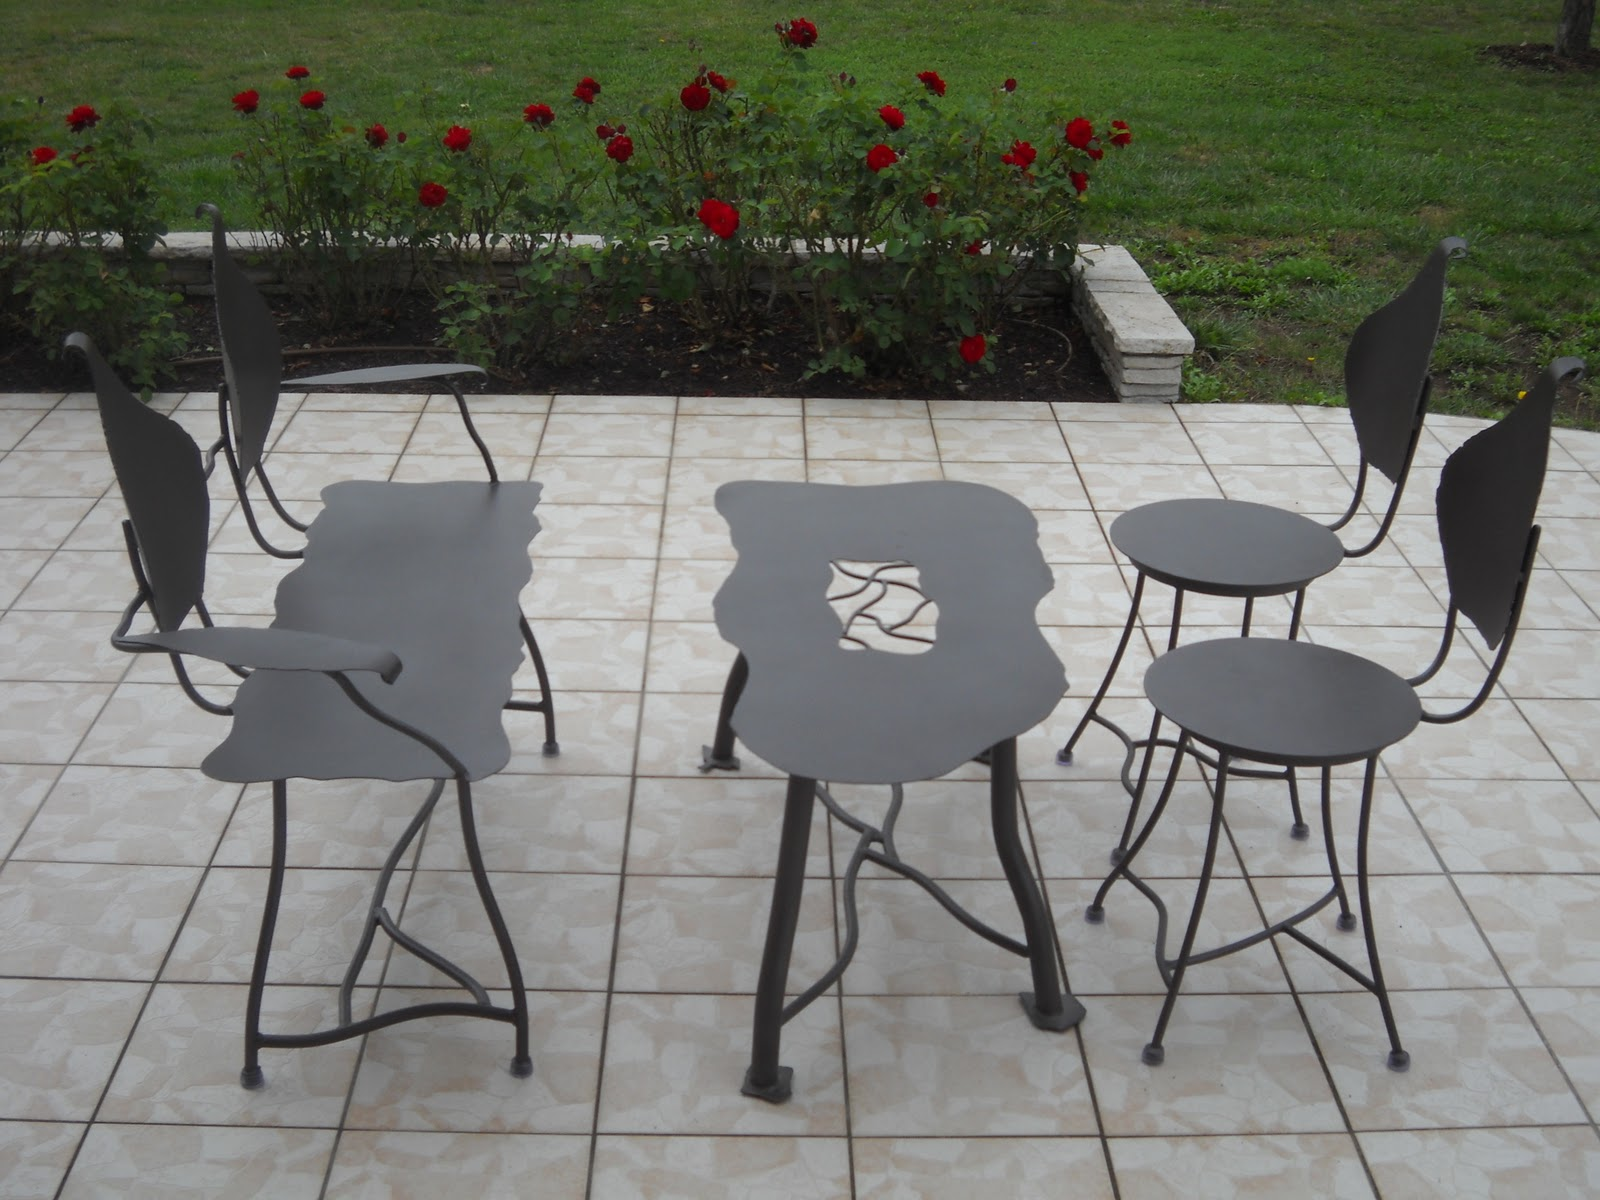 Deco phil salons de jardin for Hauteur table de jardin